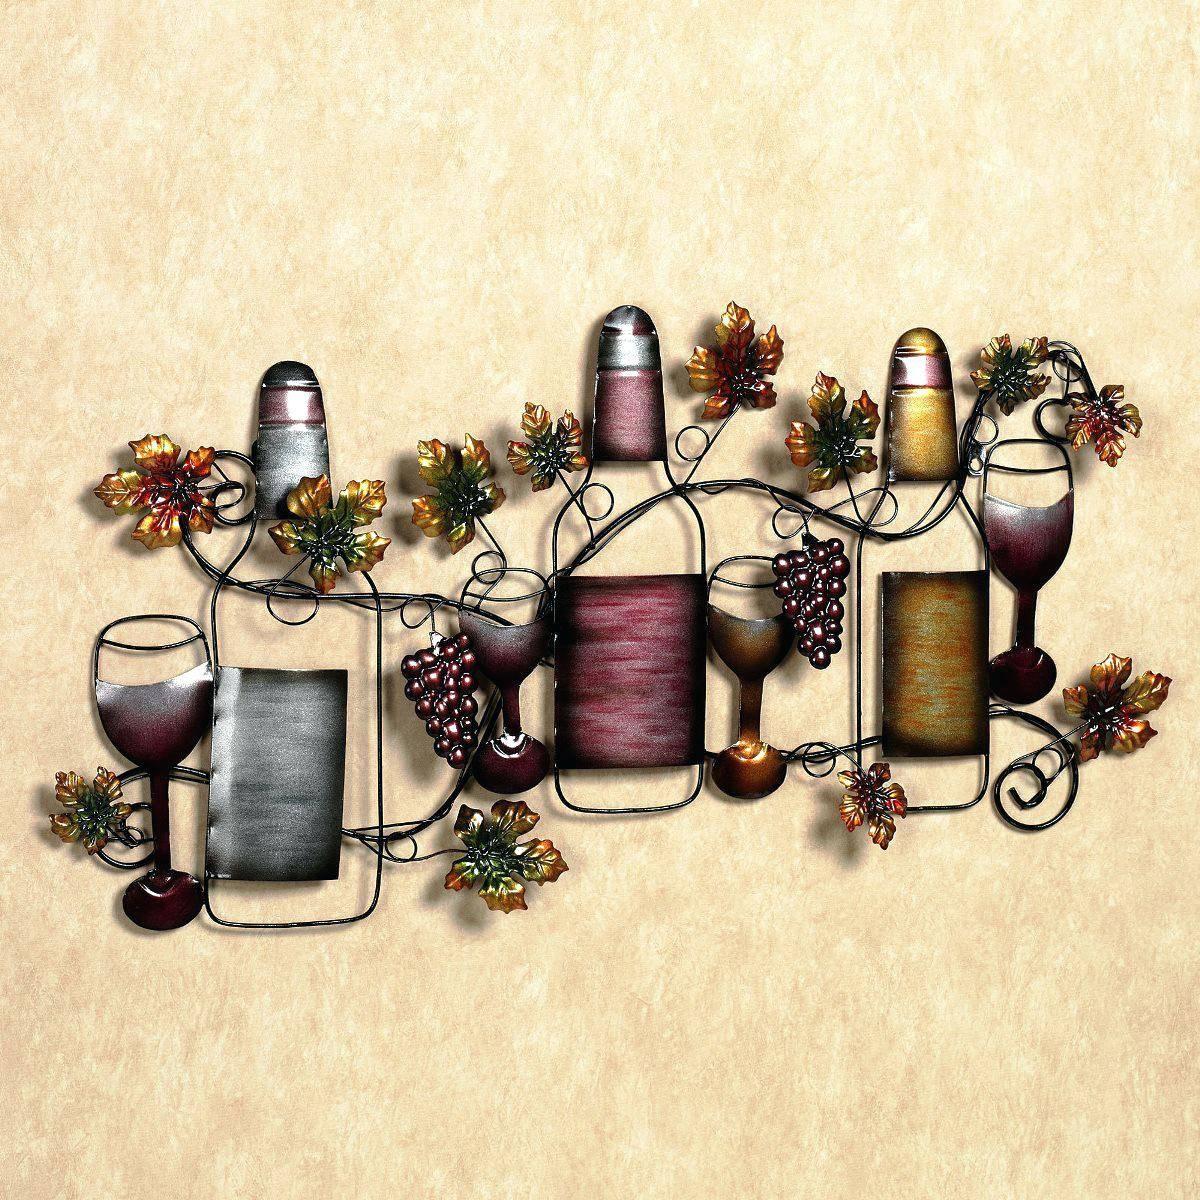 Wall Decor : 70 Mesmerizing Wine Metal Wall Art Decor Metal Wine With Newest Wine Metal Wall Art (View 17 of 20)